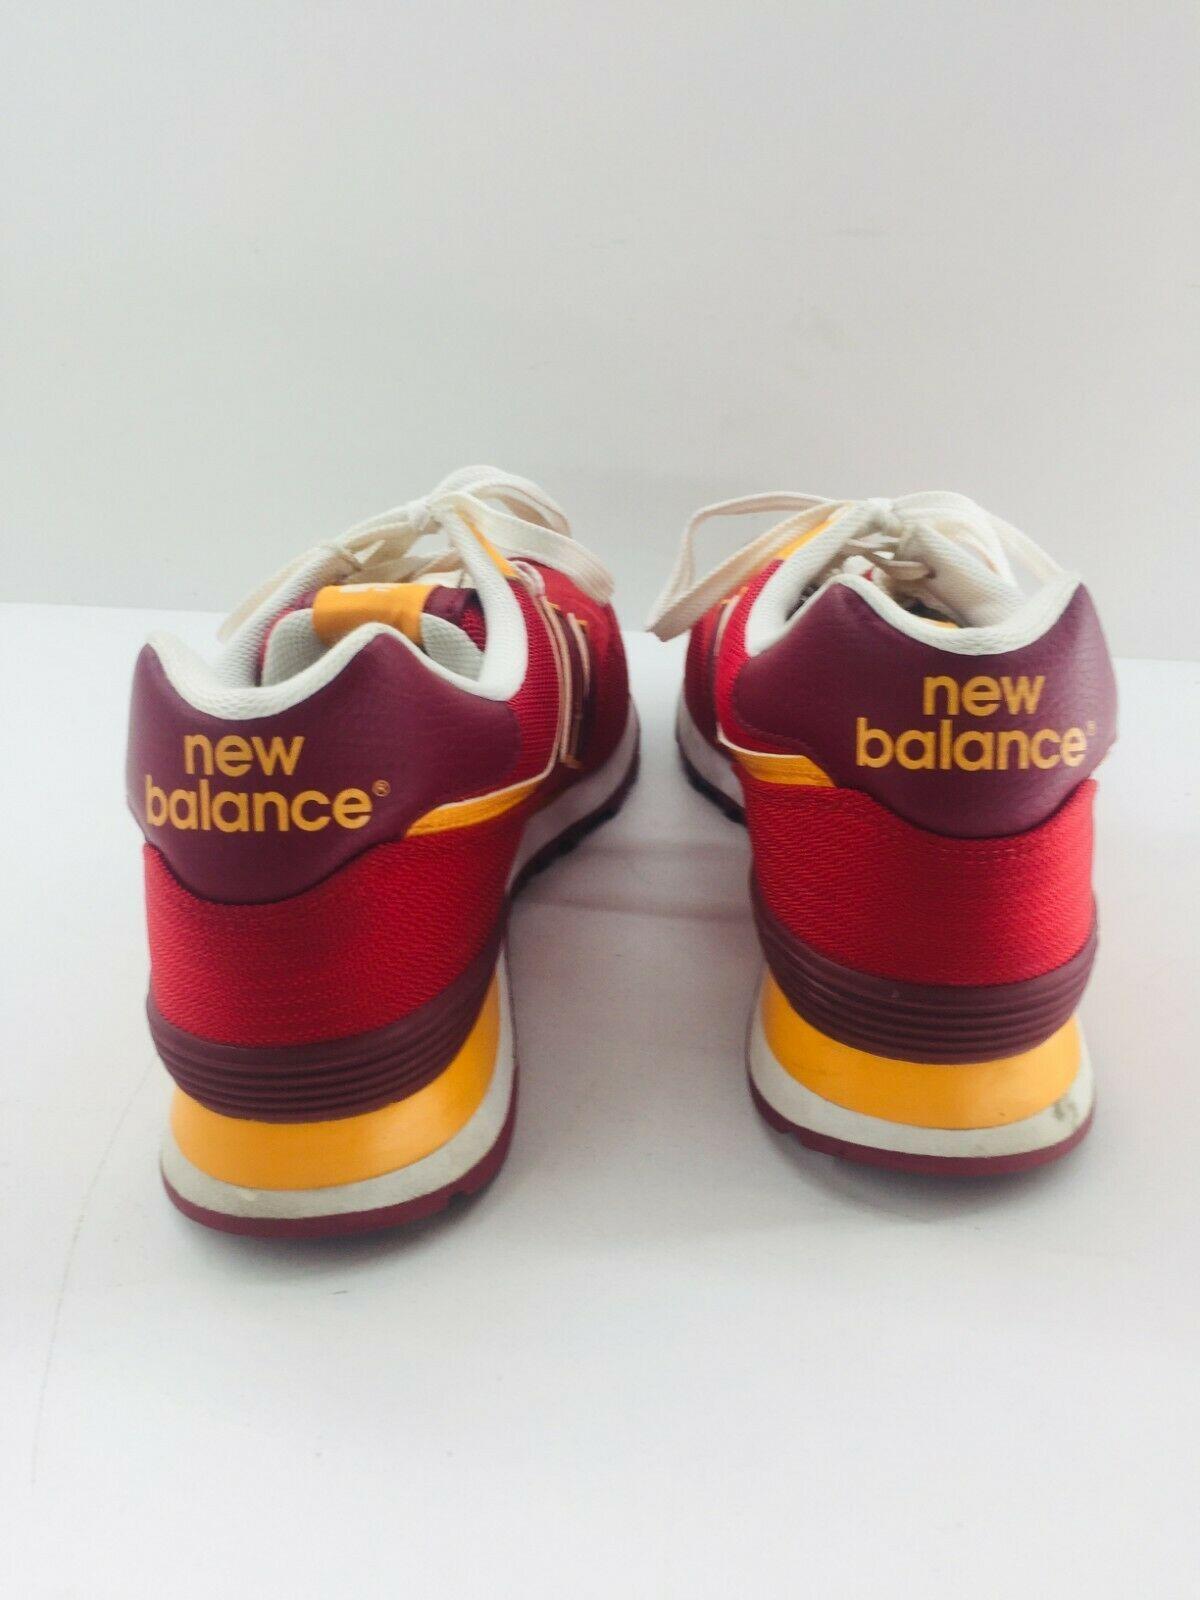 New Balance Athletic Sneaker Shoes Men's Sz 11.5 Red Orange ML574PPR  574 EUC image 7